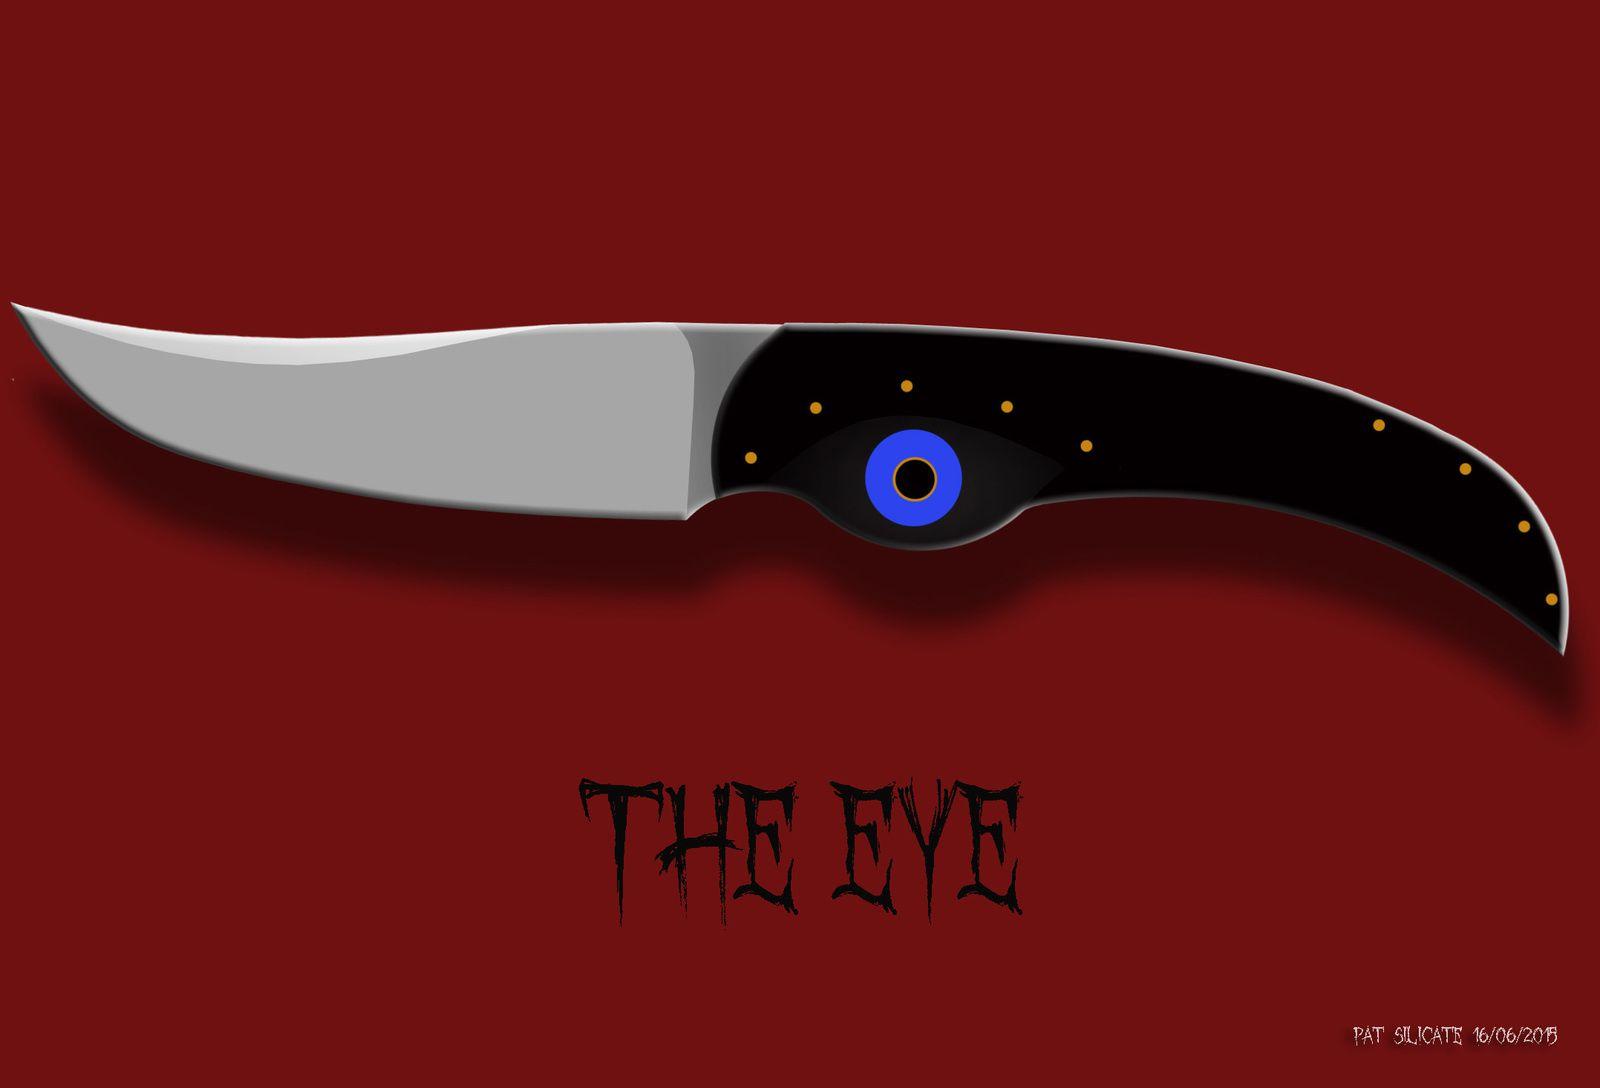 Projet : &quot&#x3B;The Eye&quot&#x3B;